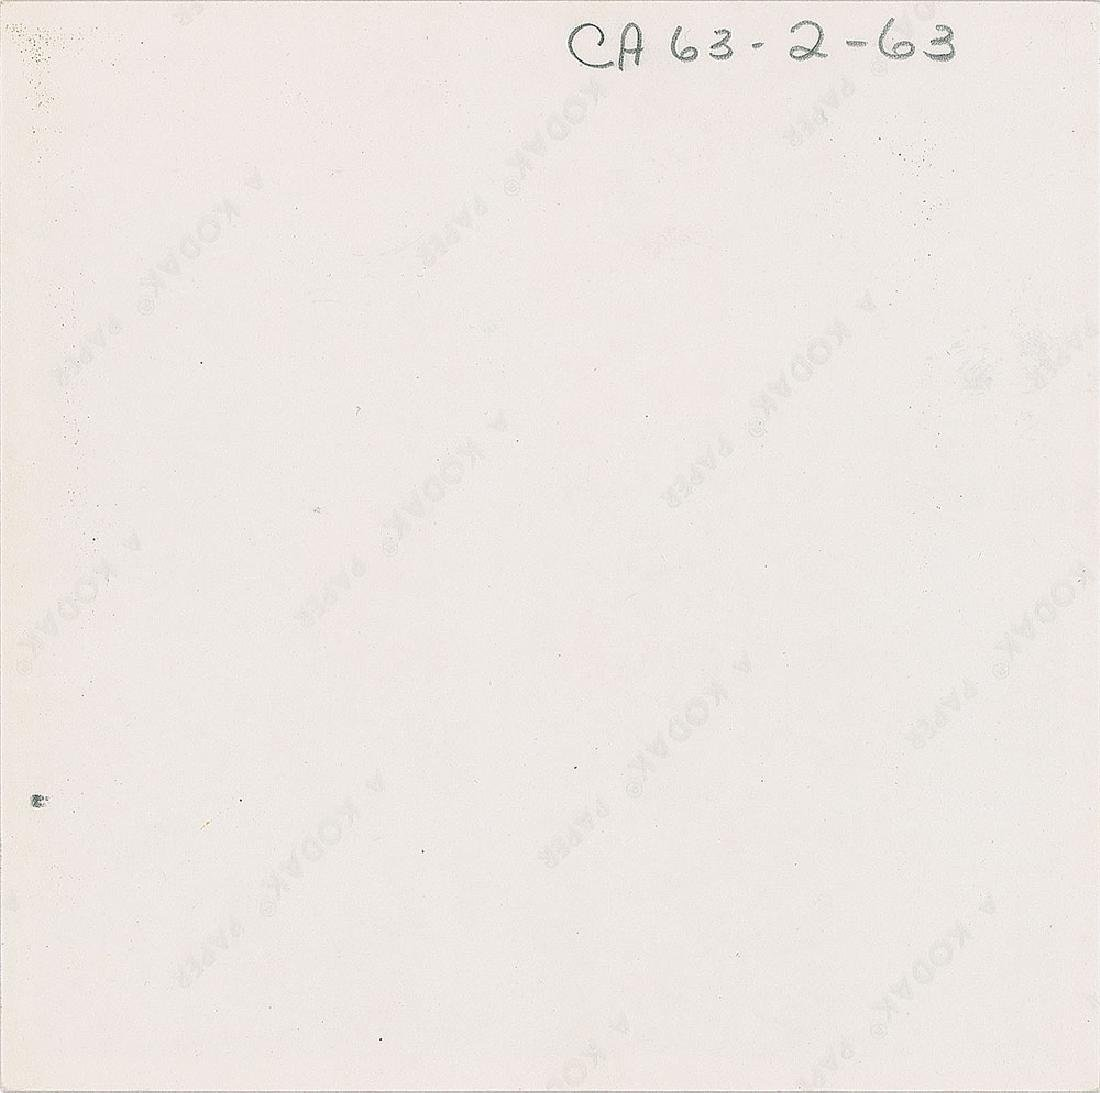 John F. Kennedy Original Vintage Photograph by Cecil Stoughton - 2